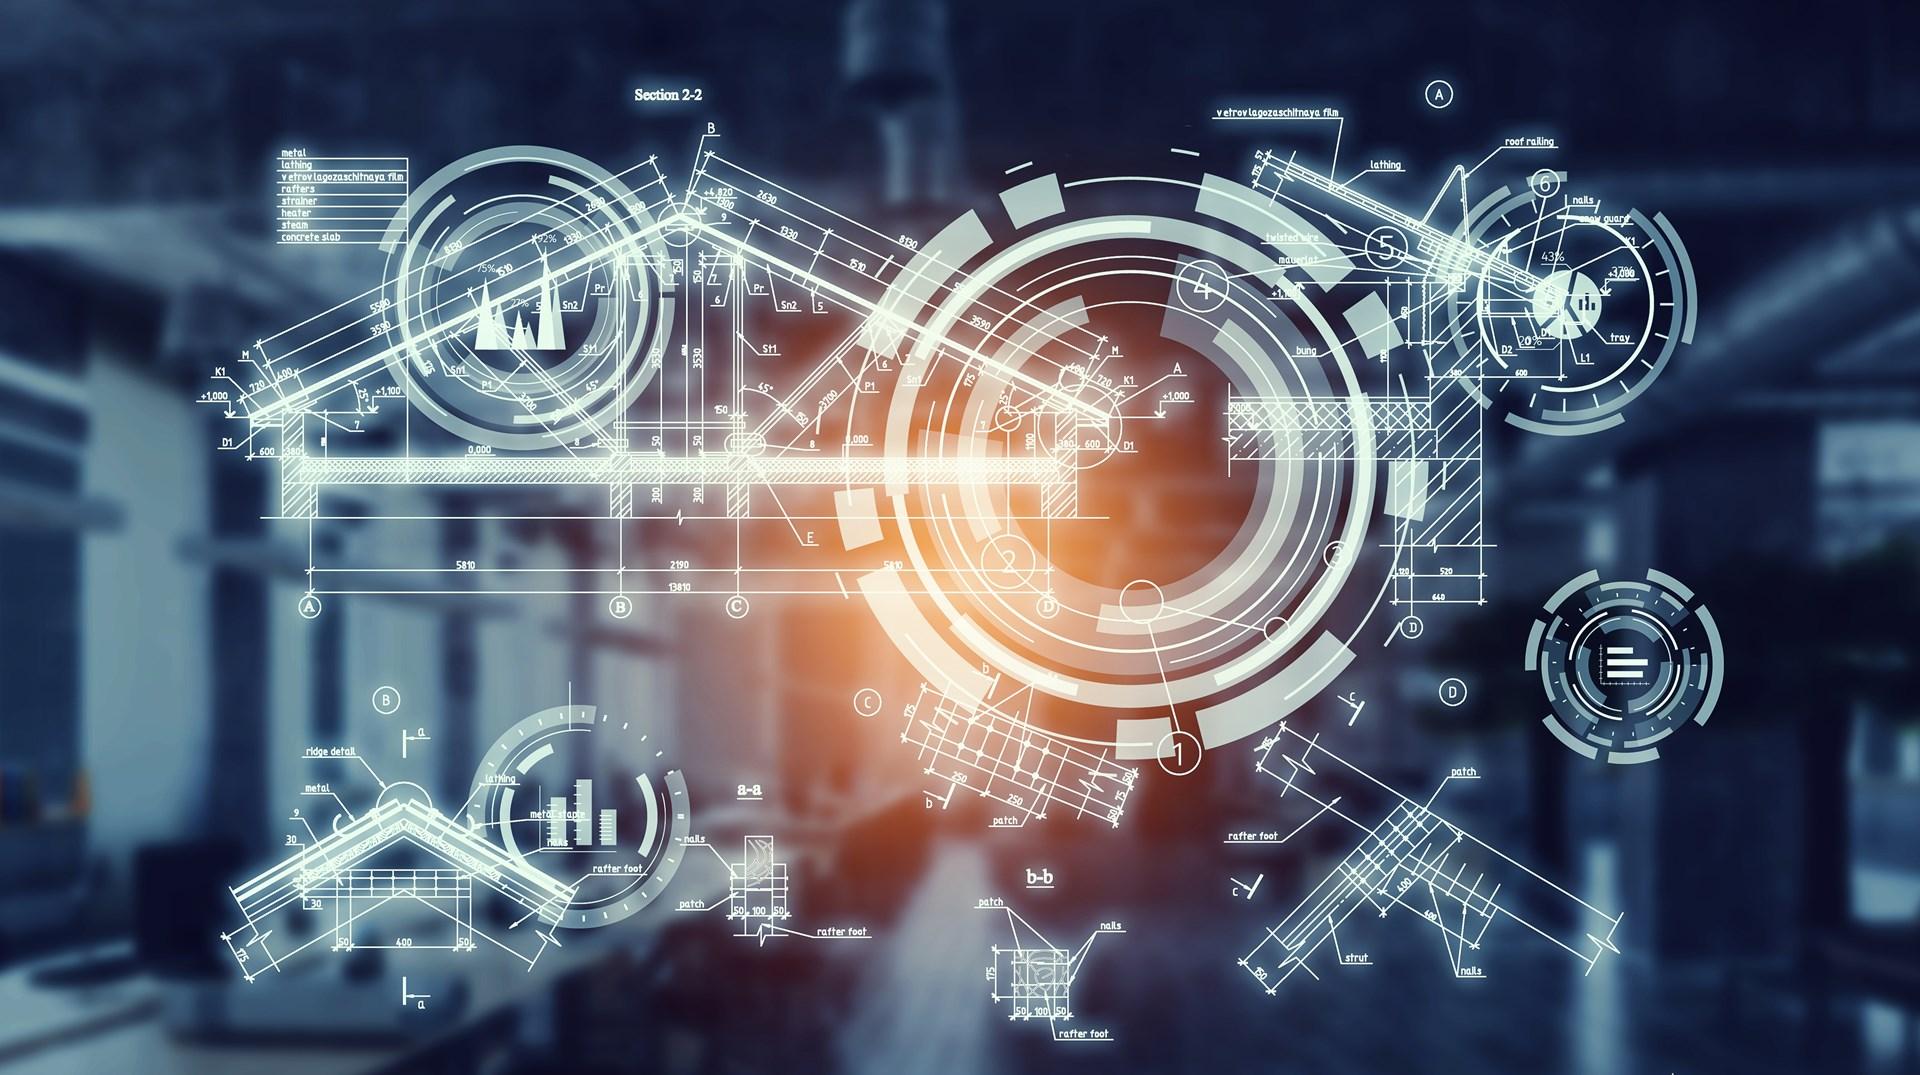 Sinteza, the platform of innovation